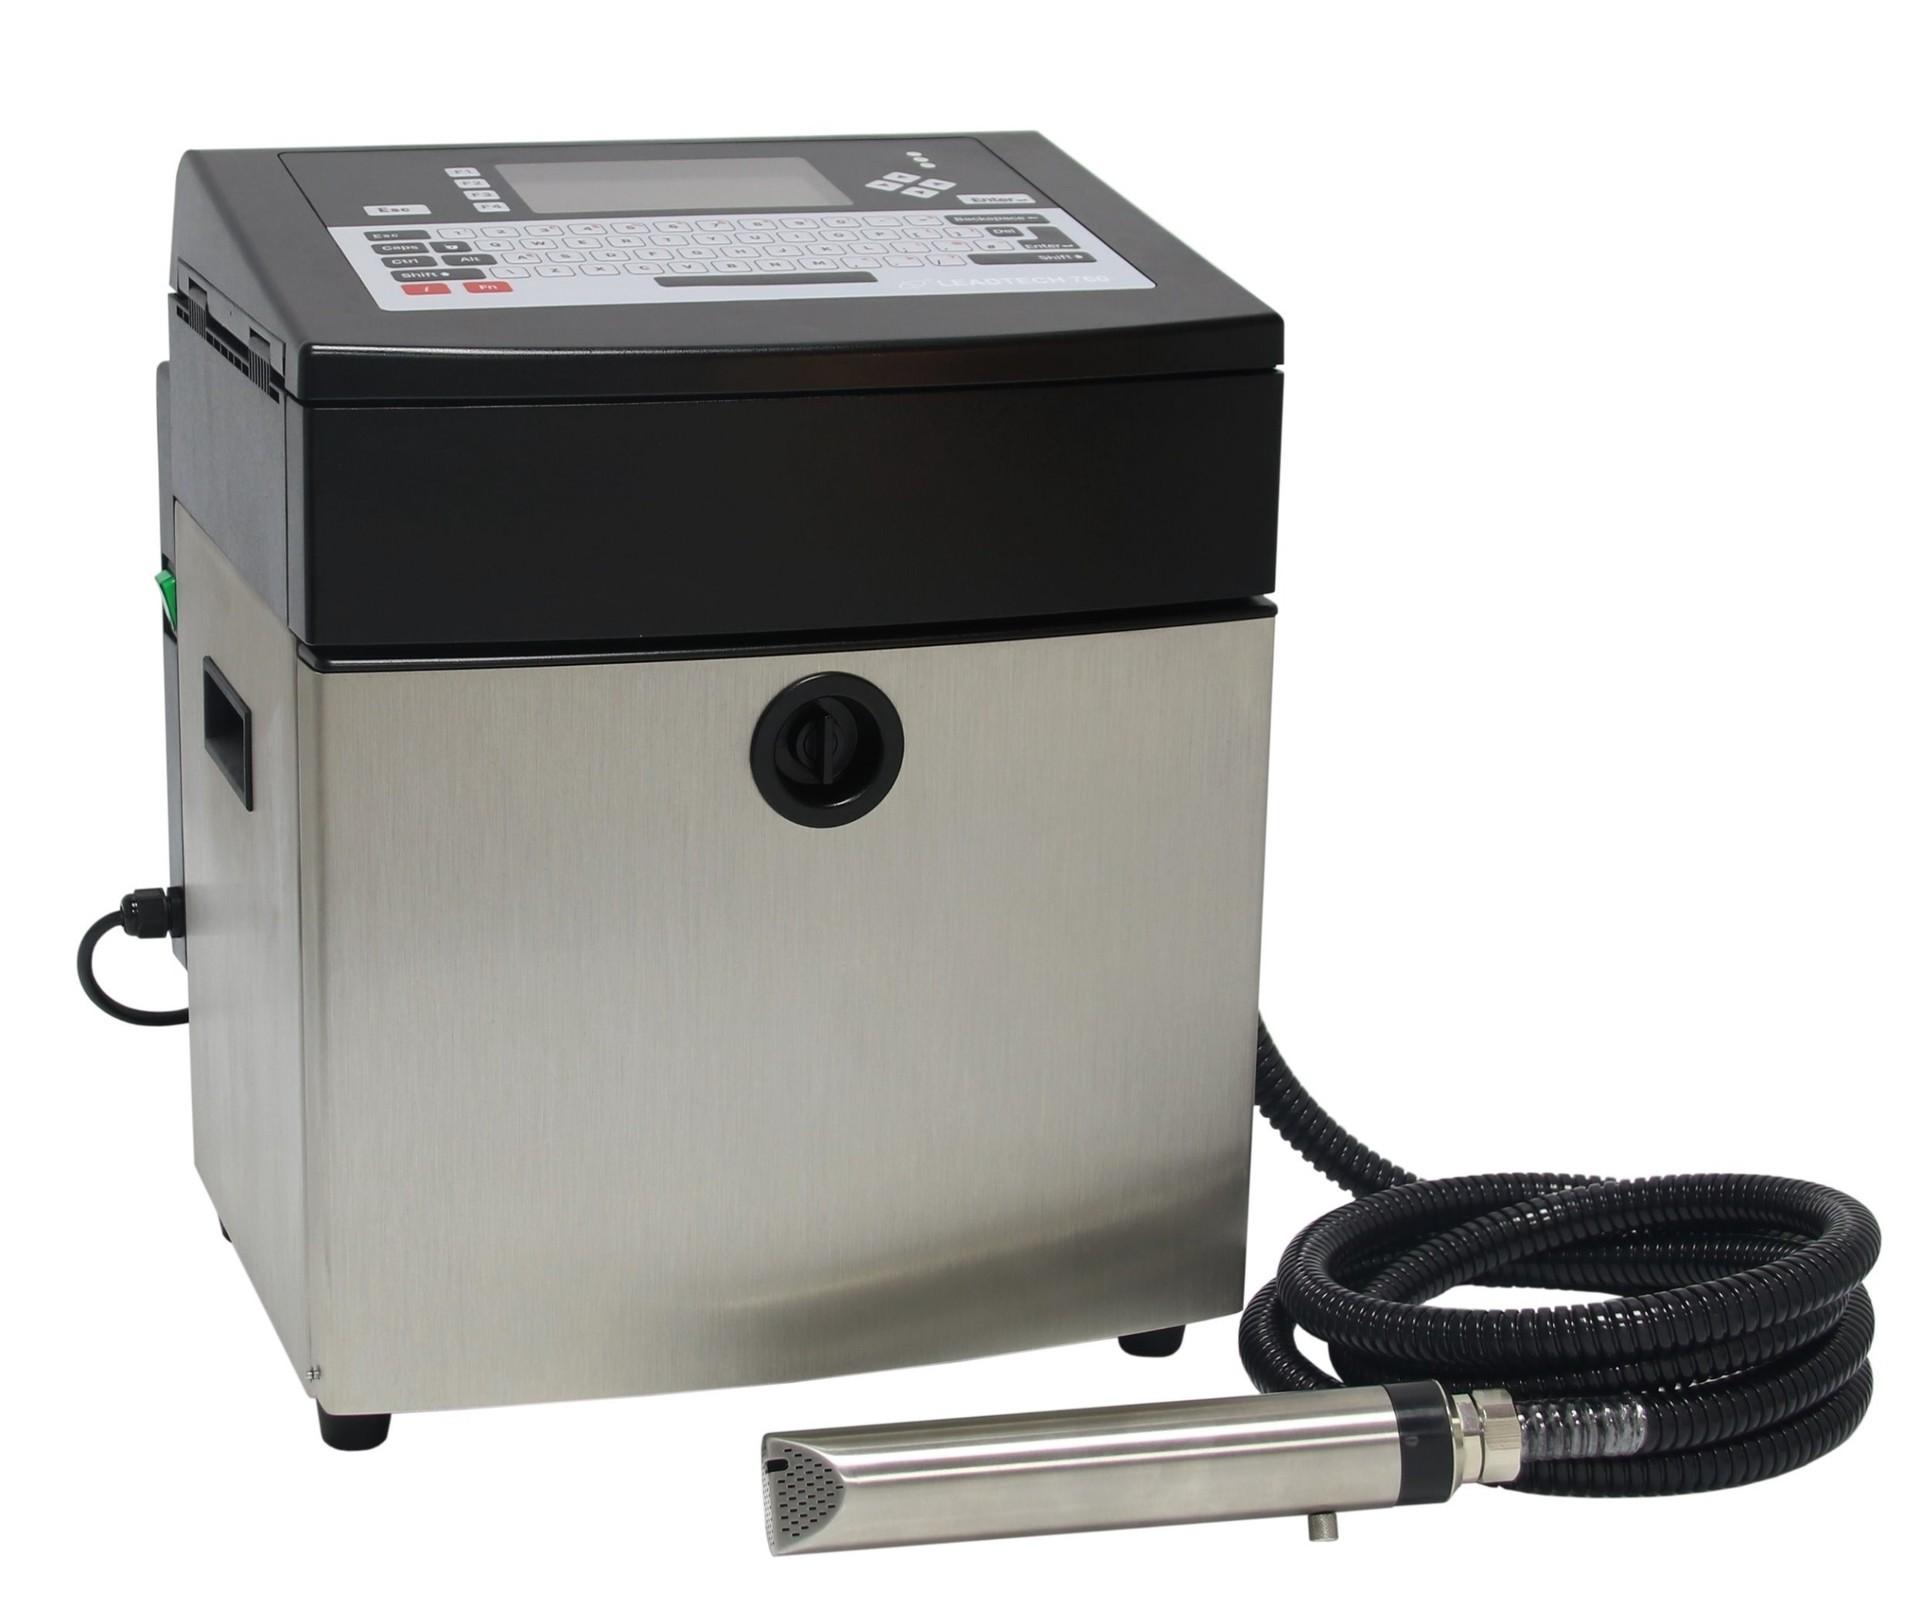 Lead Tech LT800 Dole Can Printing Industrial Inkjet Printer